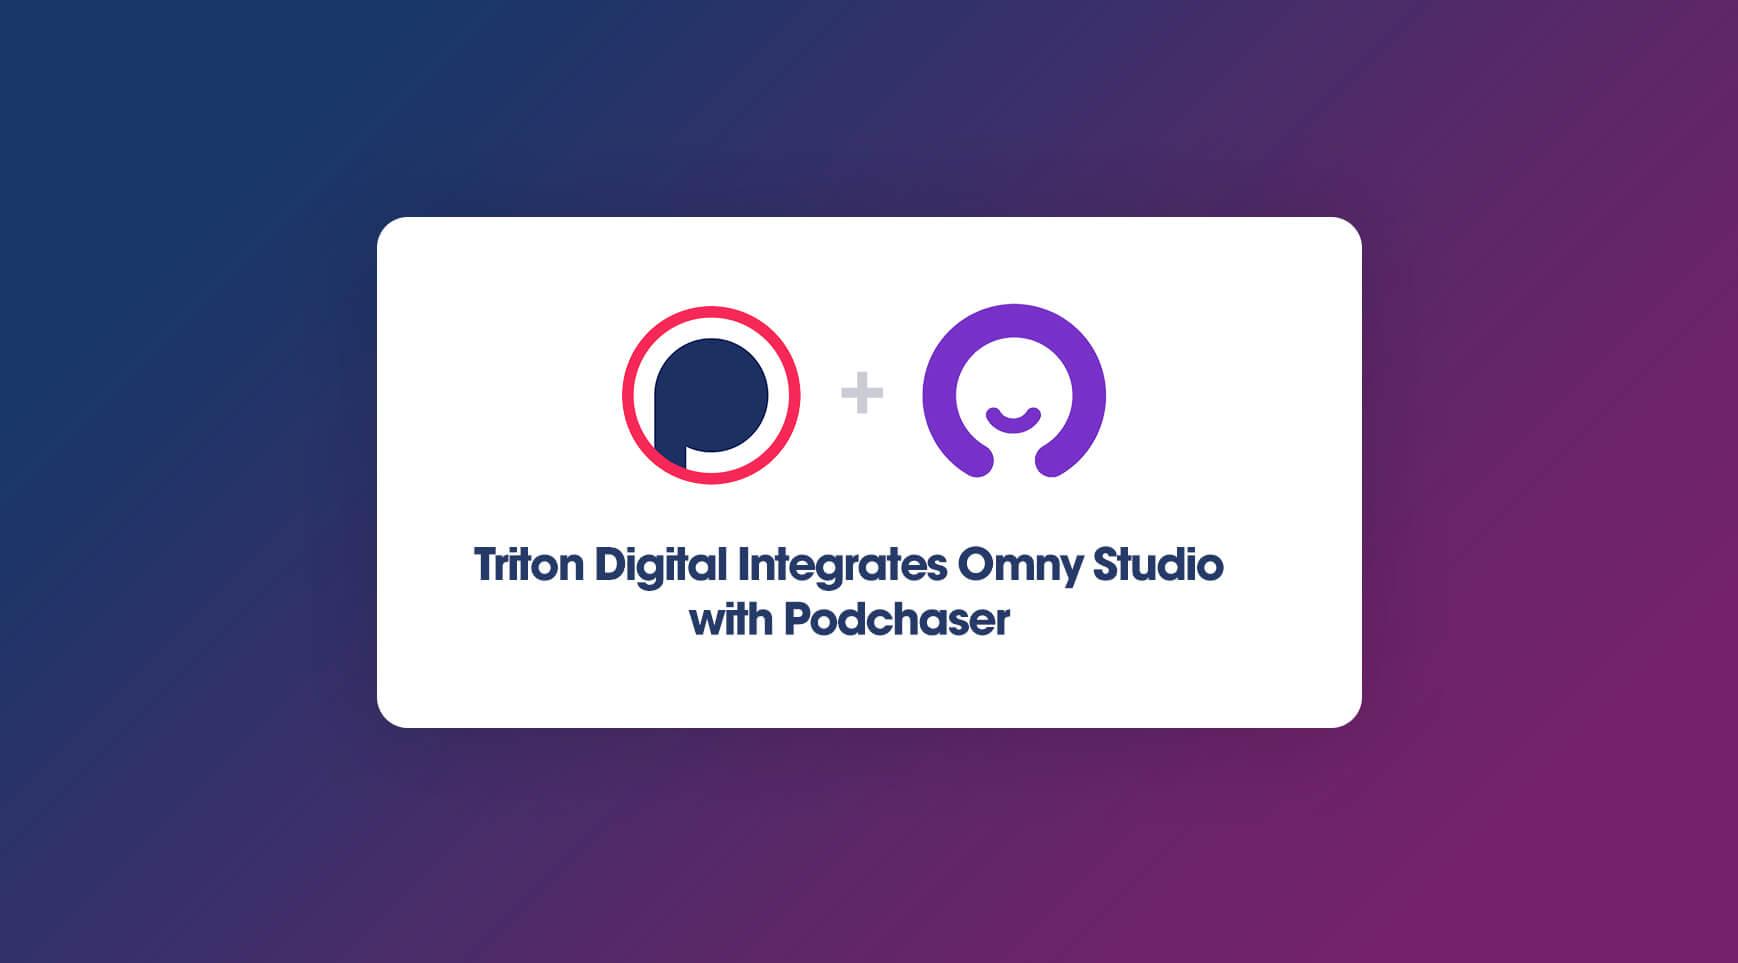 New! Add Creator & Guest Credits within Omny Studio